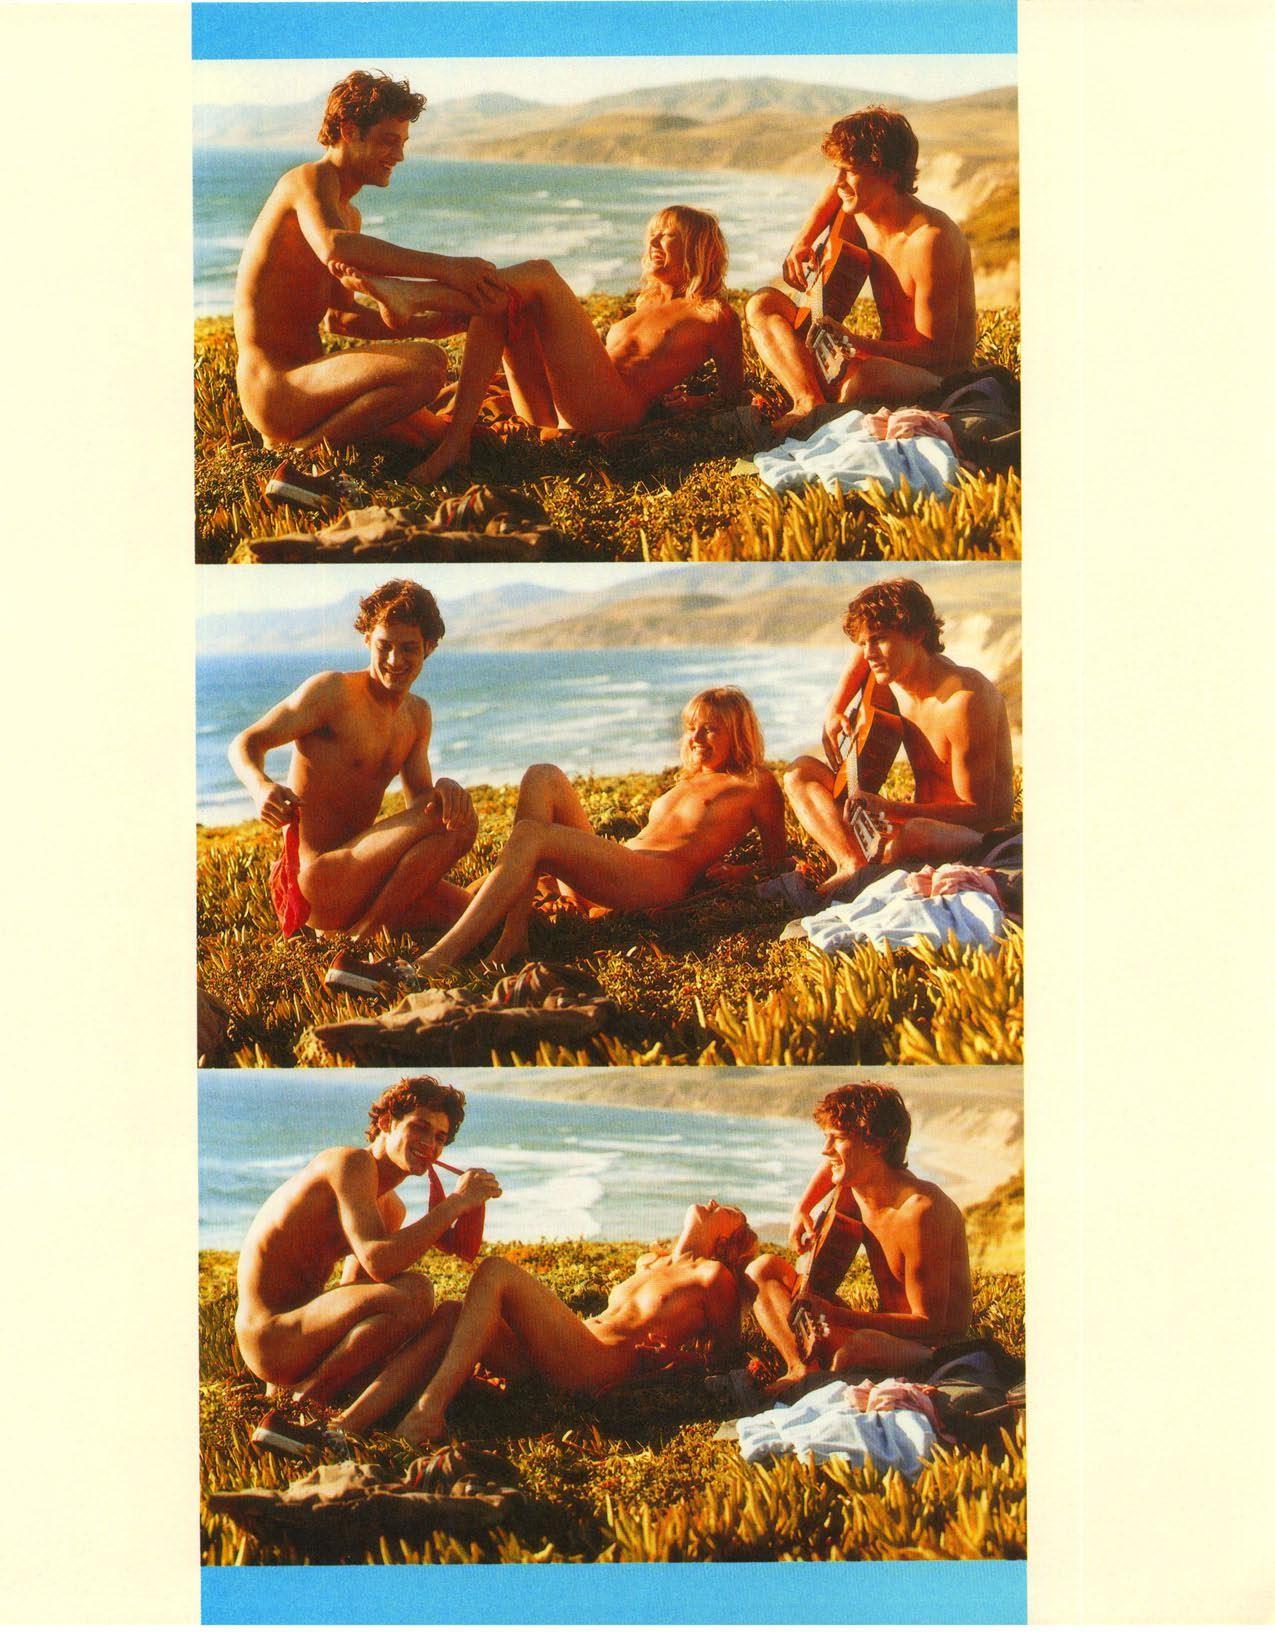 Fotos desnudas de malin akerman